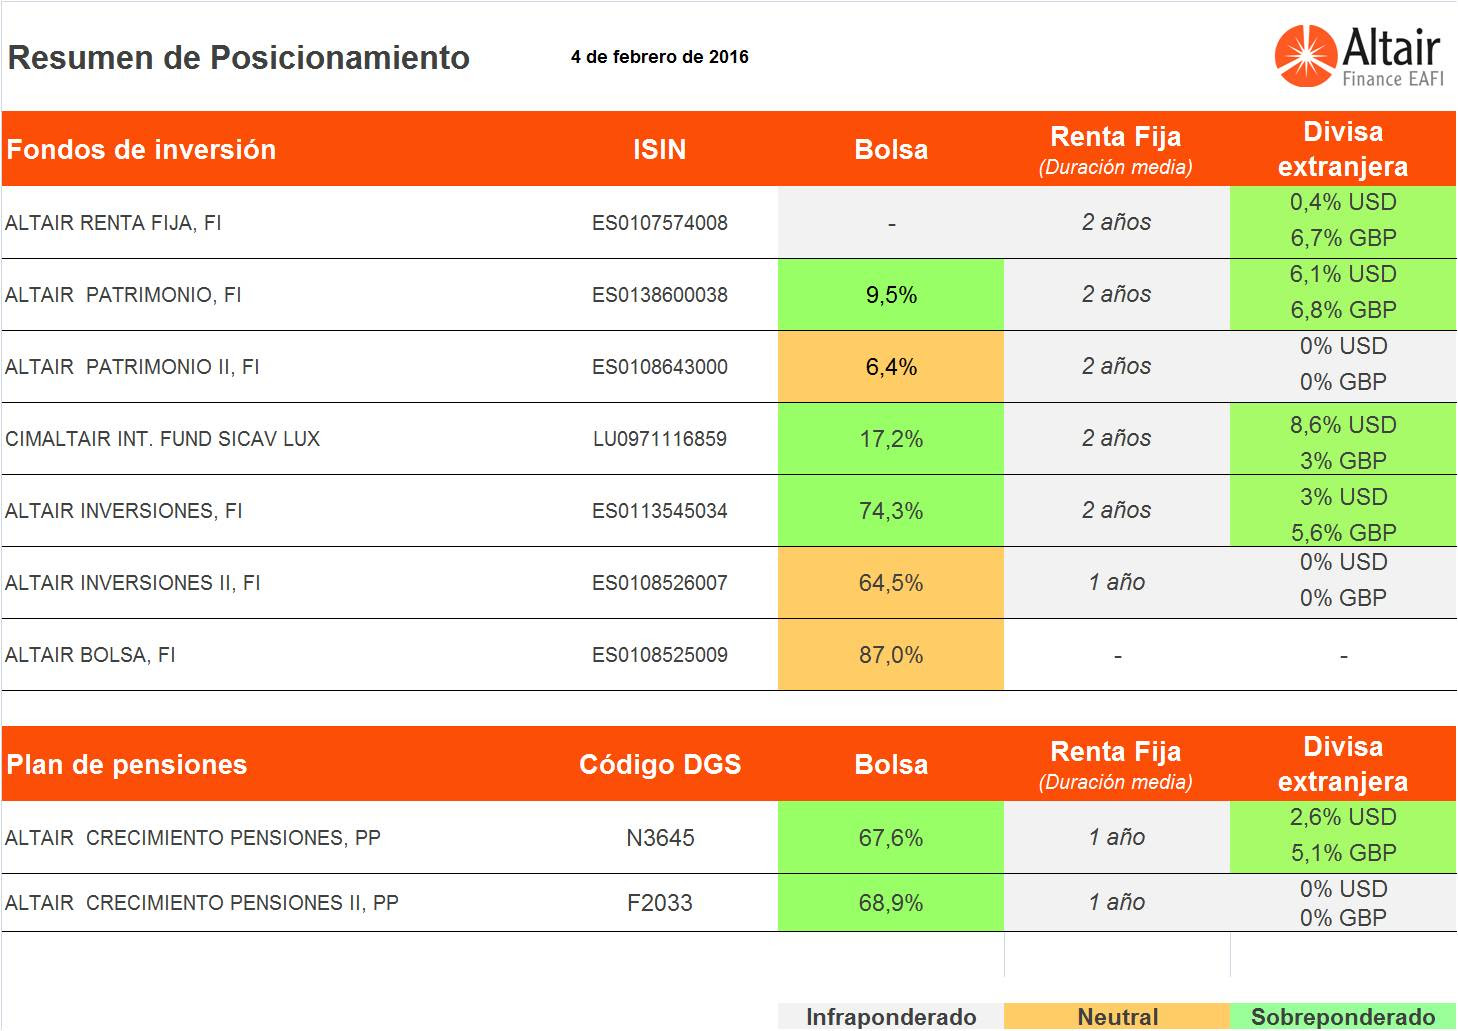 cuadro-posicionamiento-fondos-asesorados-altair-finance